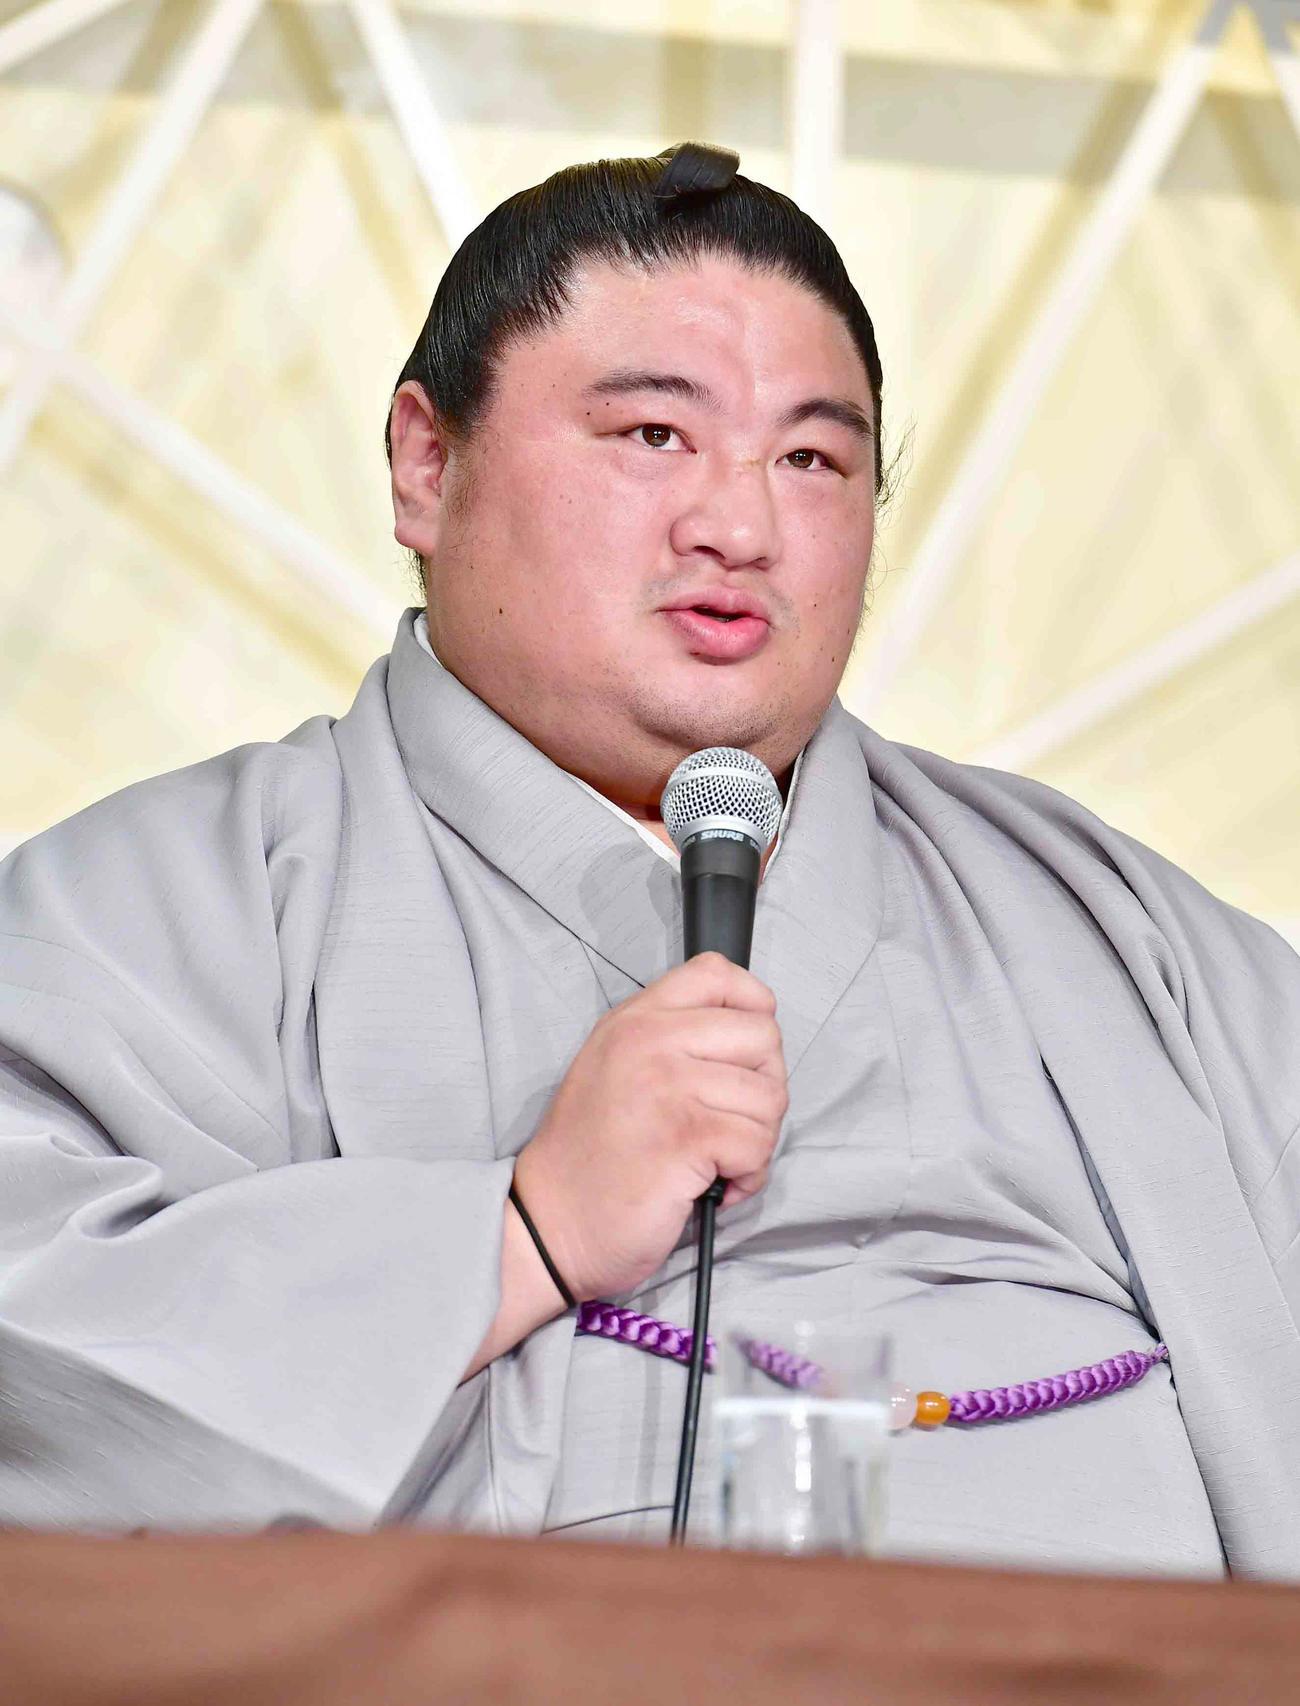 元関脇嘉風の中村親方(2019年9月16日撮影)